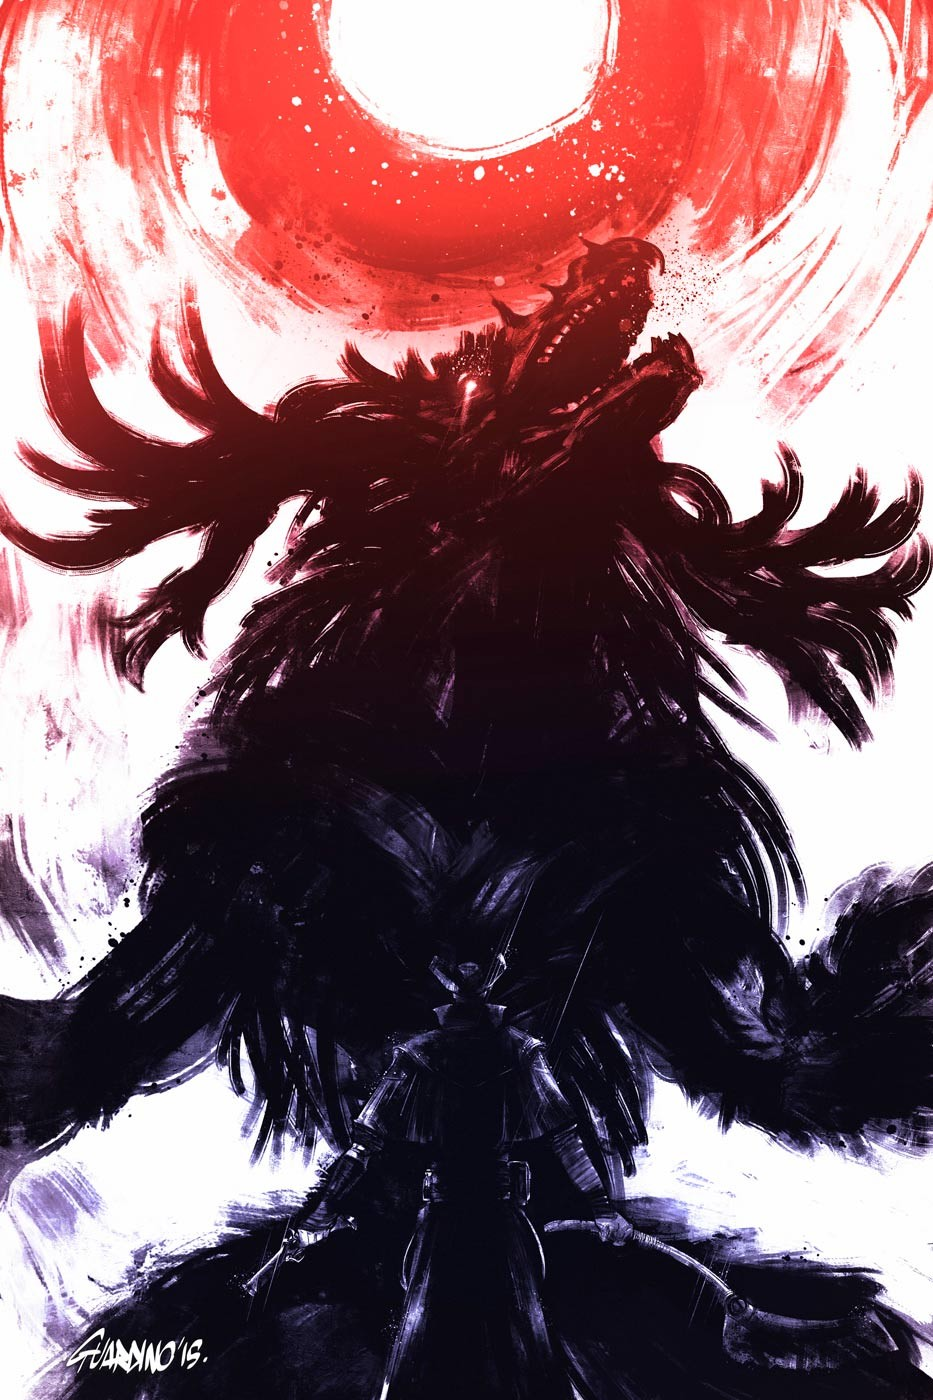 Bloodborne - Cleric Beast by Artsed on DeviantArt